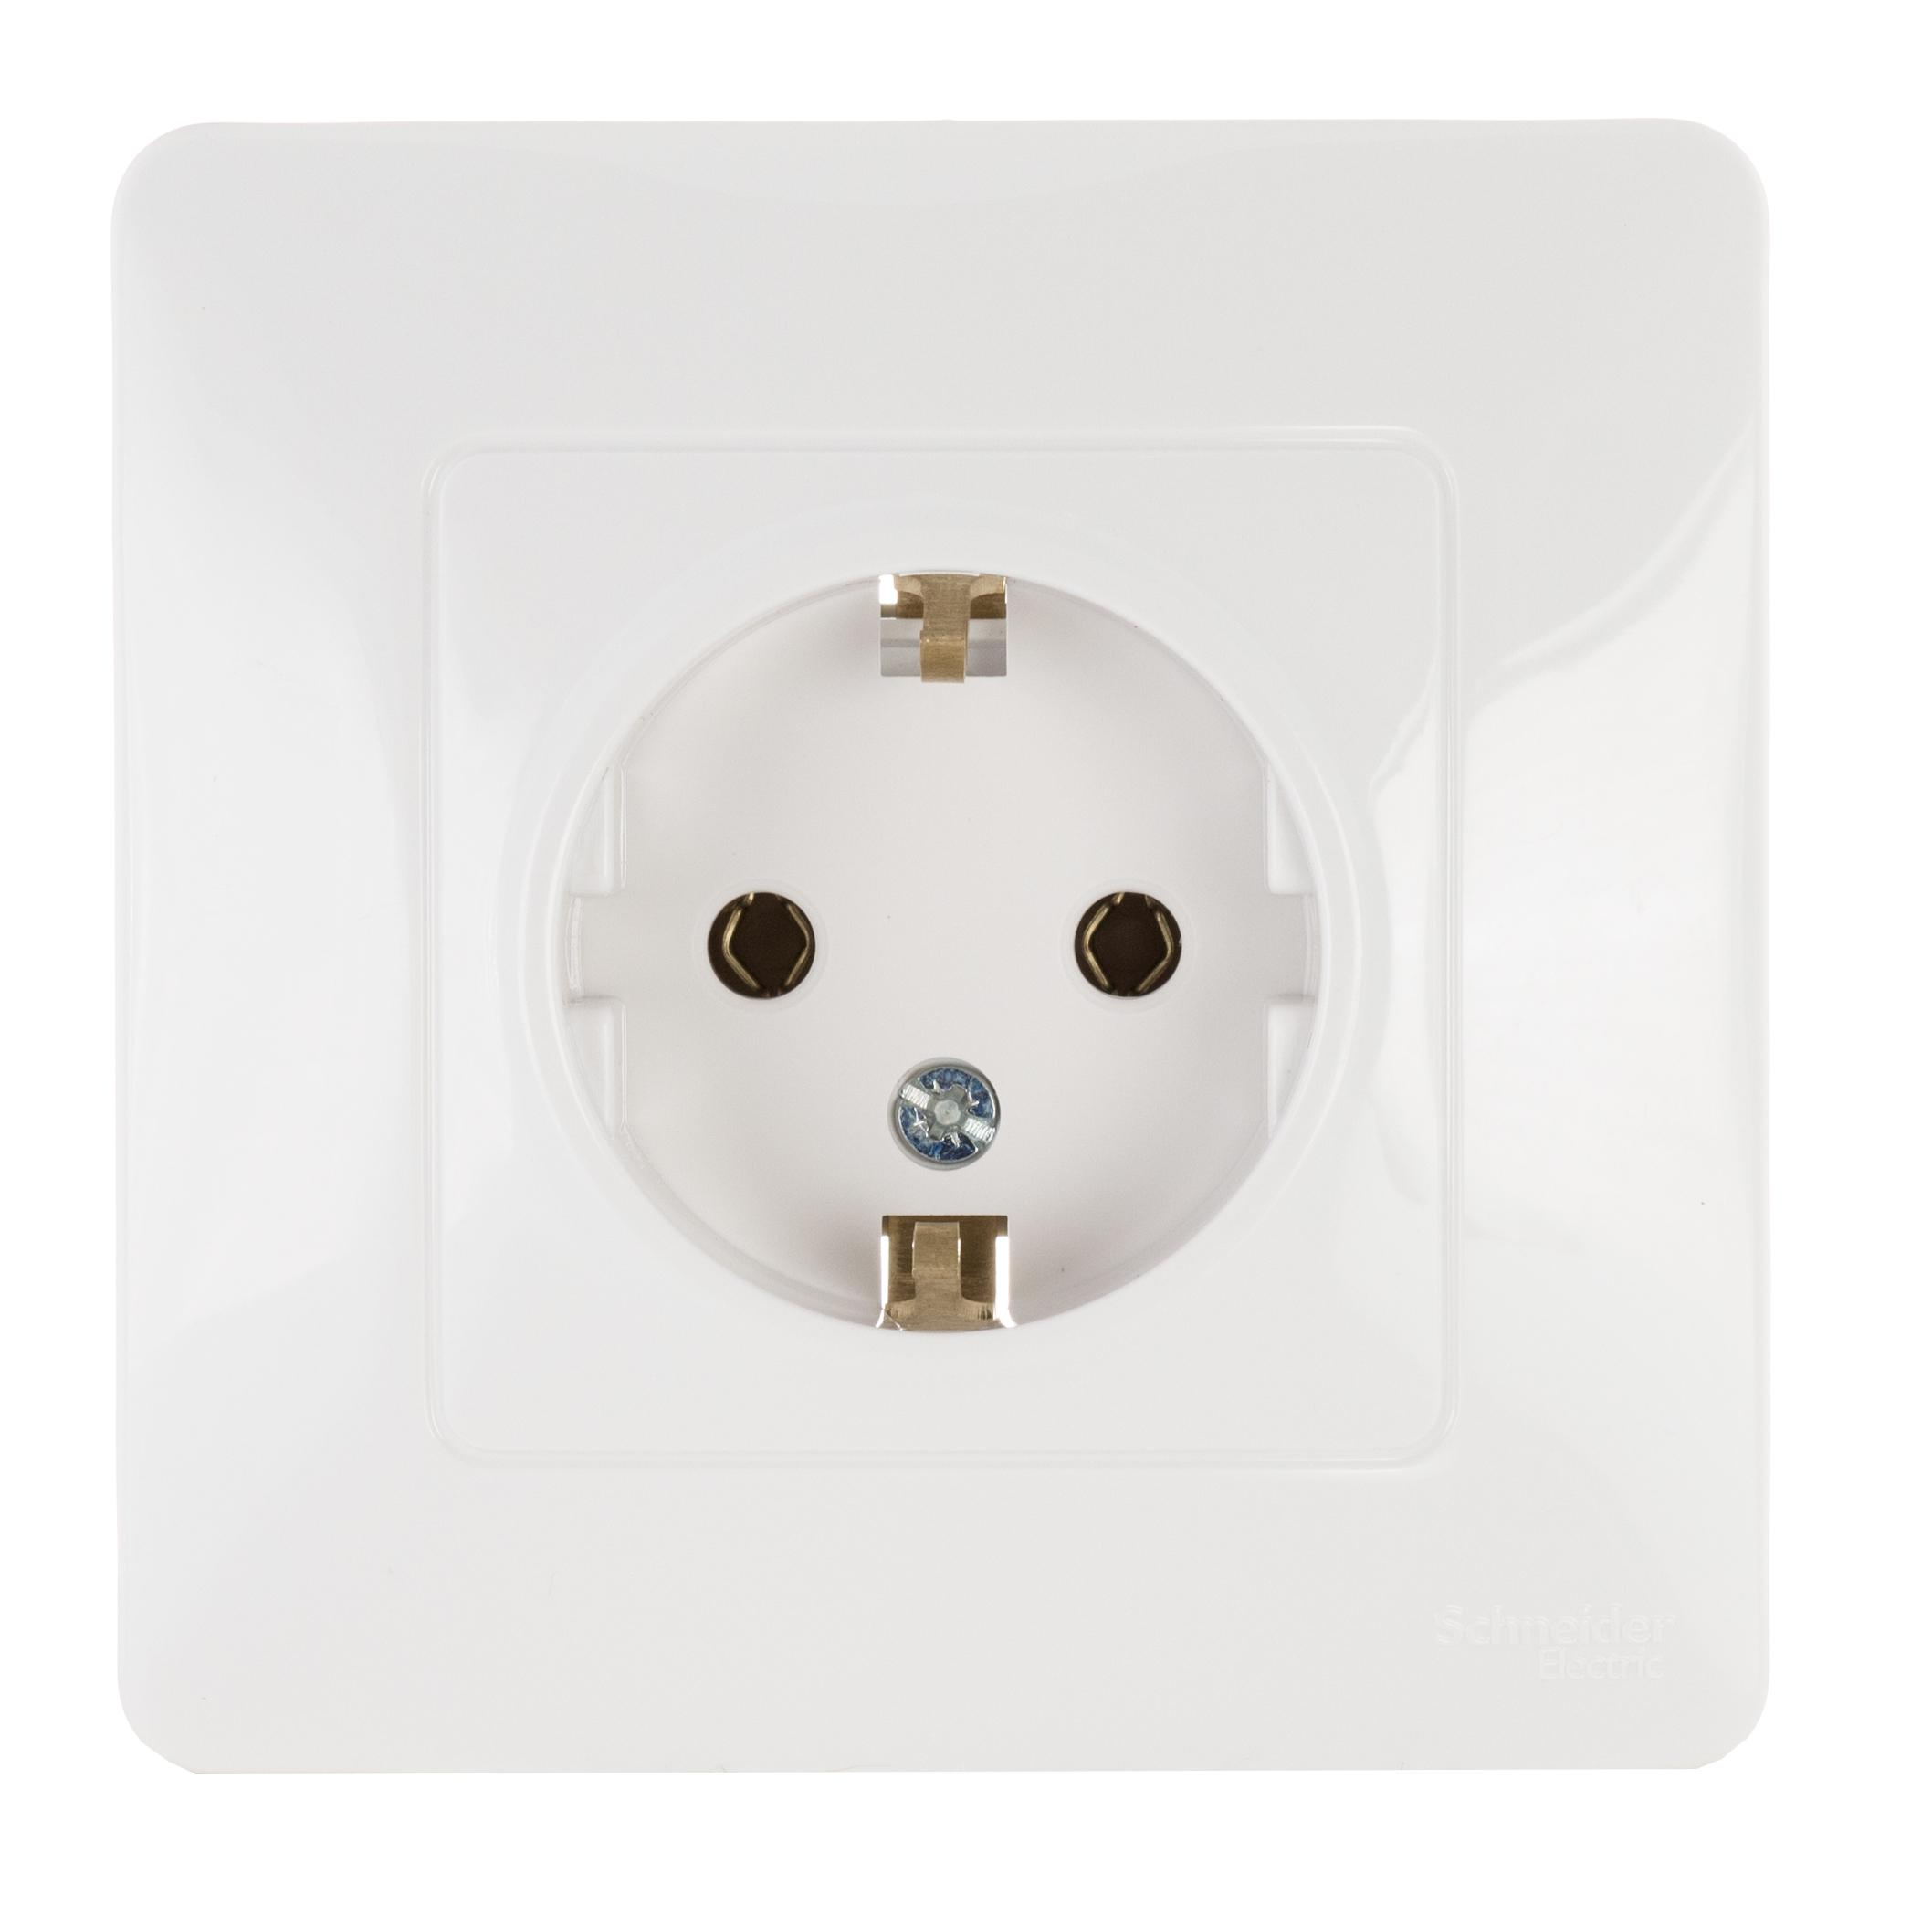 Розетка Schneider electric Blnrs001011